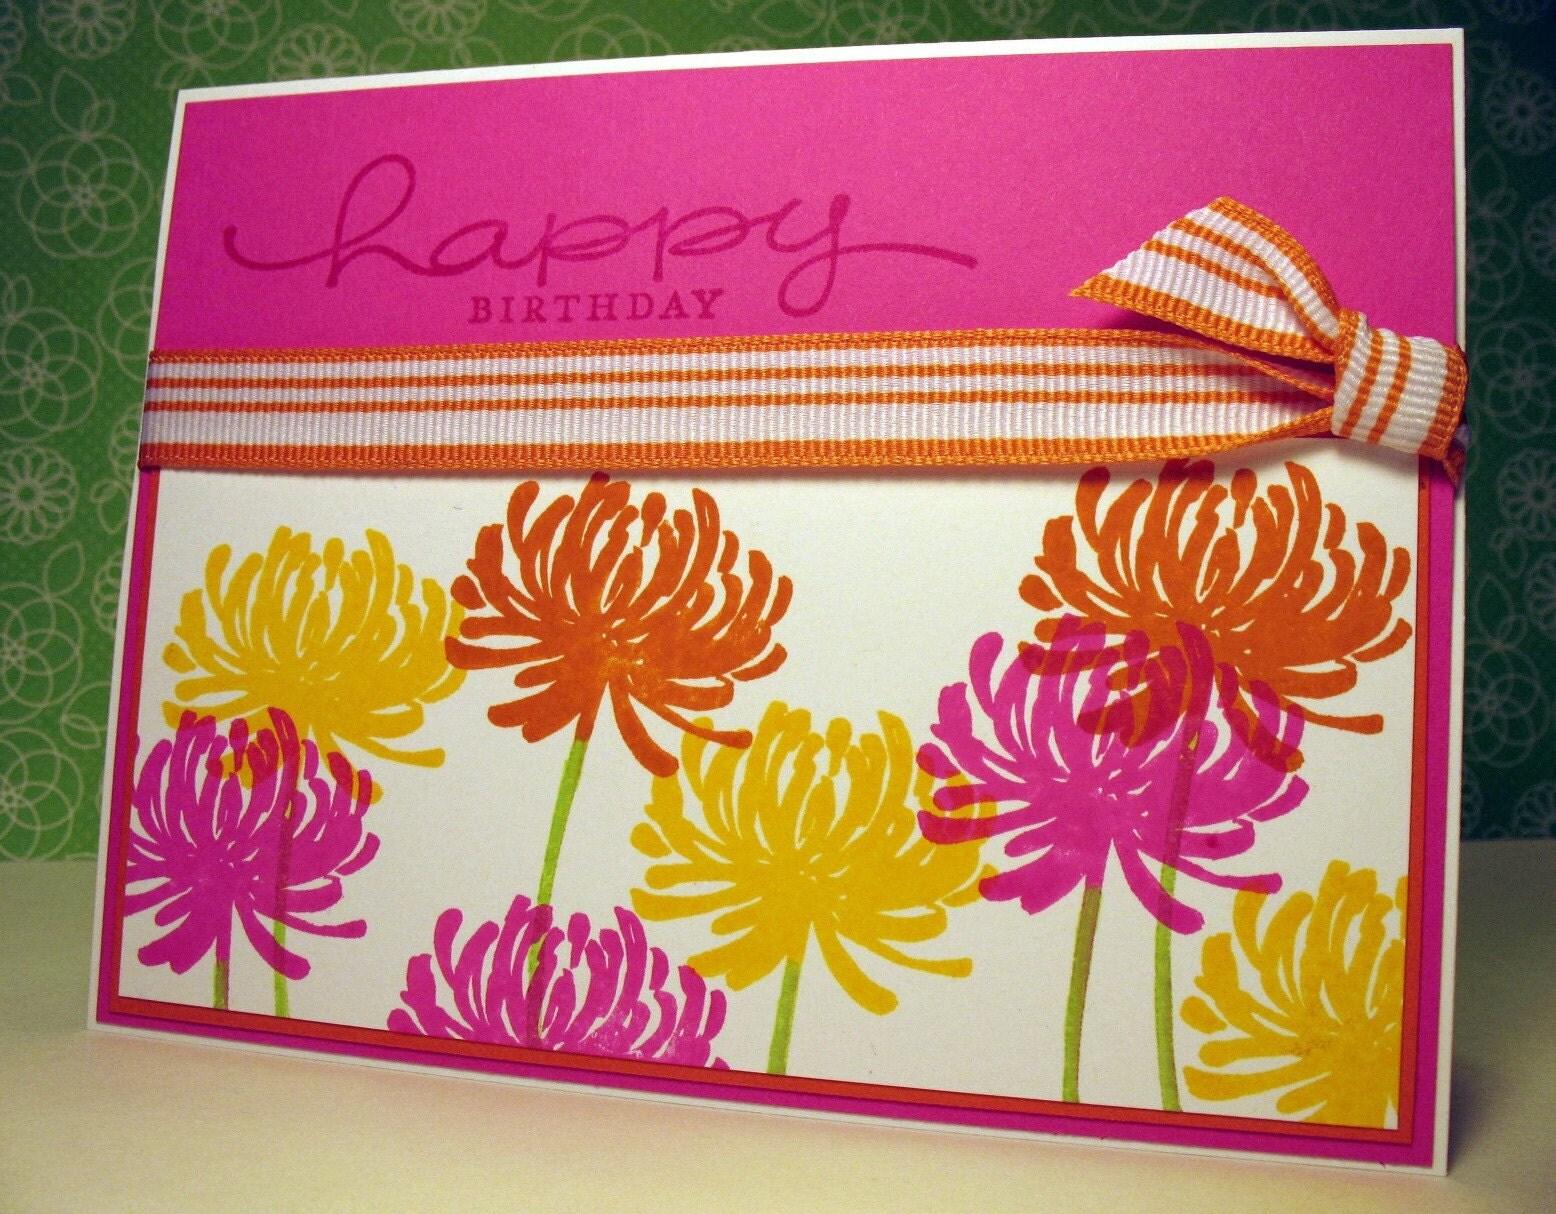 EtsyGreetings Handmade Cards August 2010 – Birthday Greeting Card for Teacher